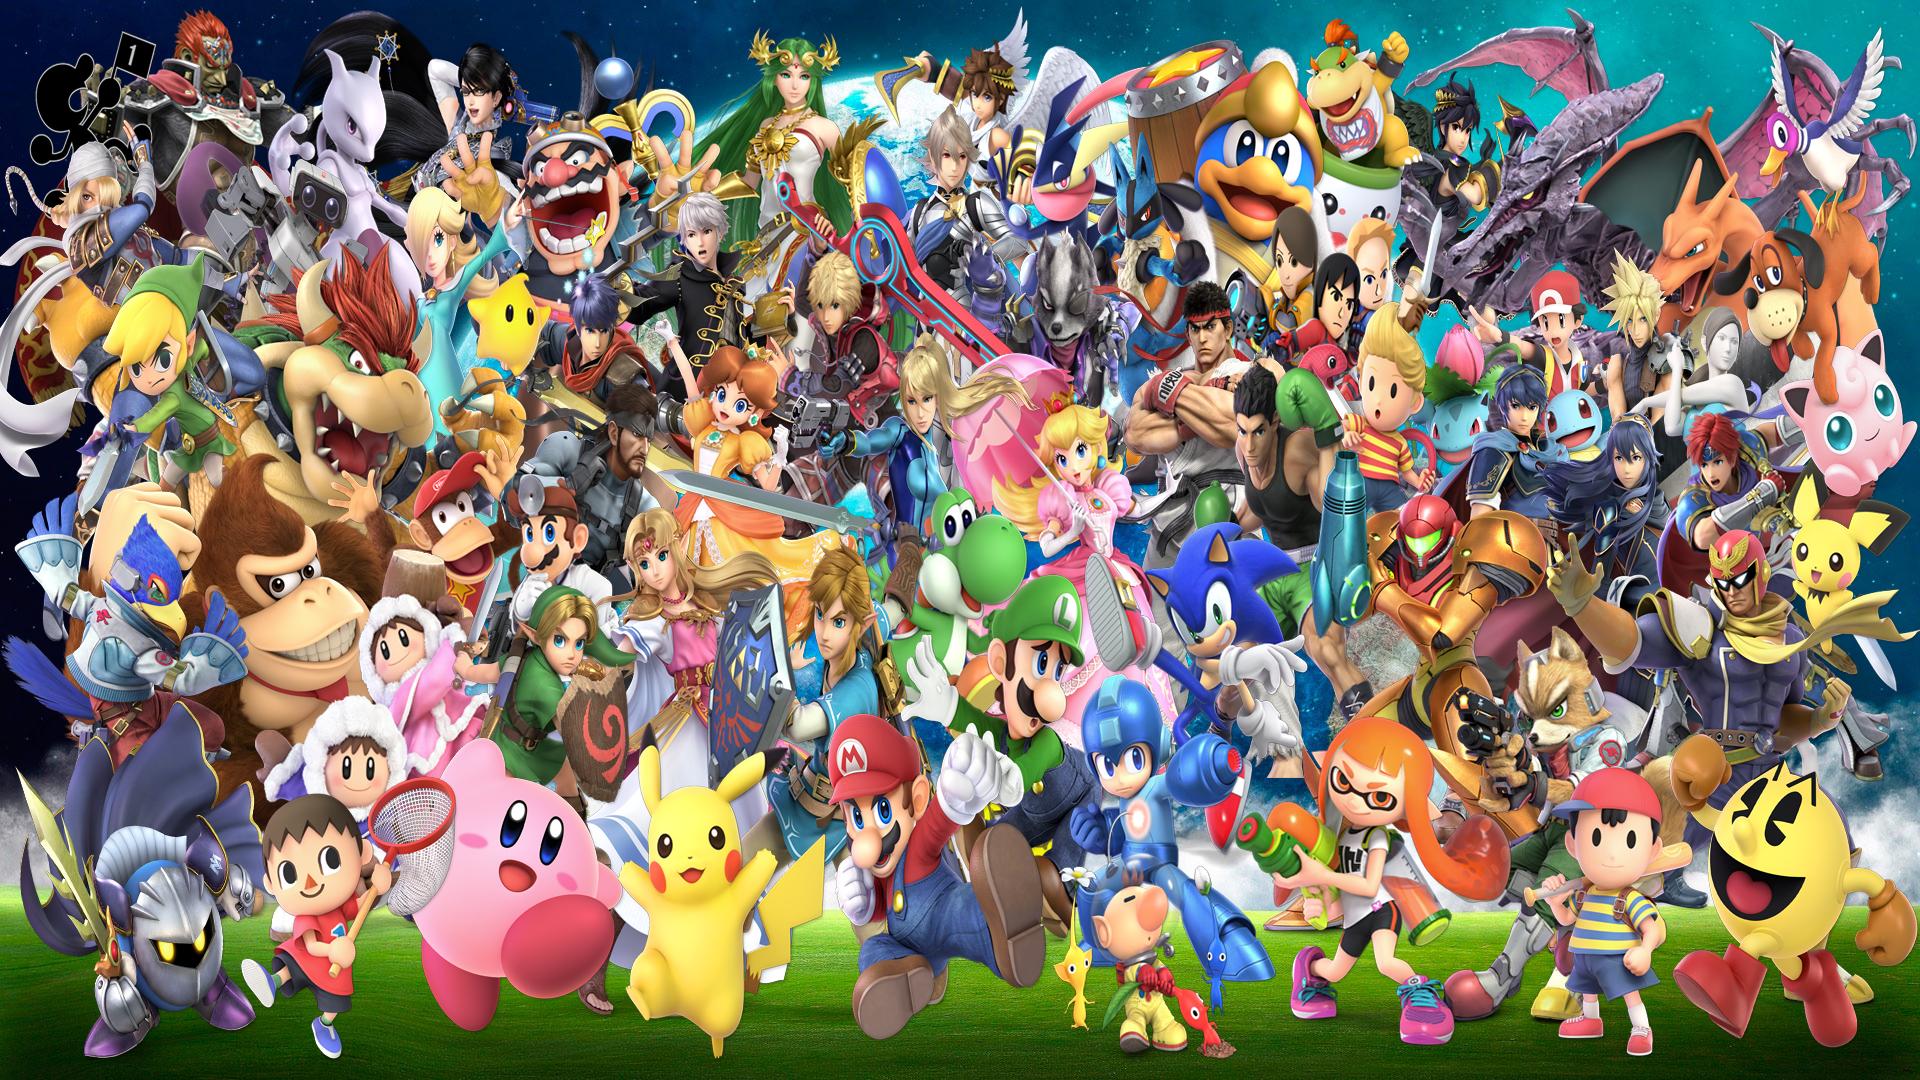 Free Download Super Smash Bros Ultimate By Darkmangc 1920x1080